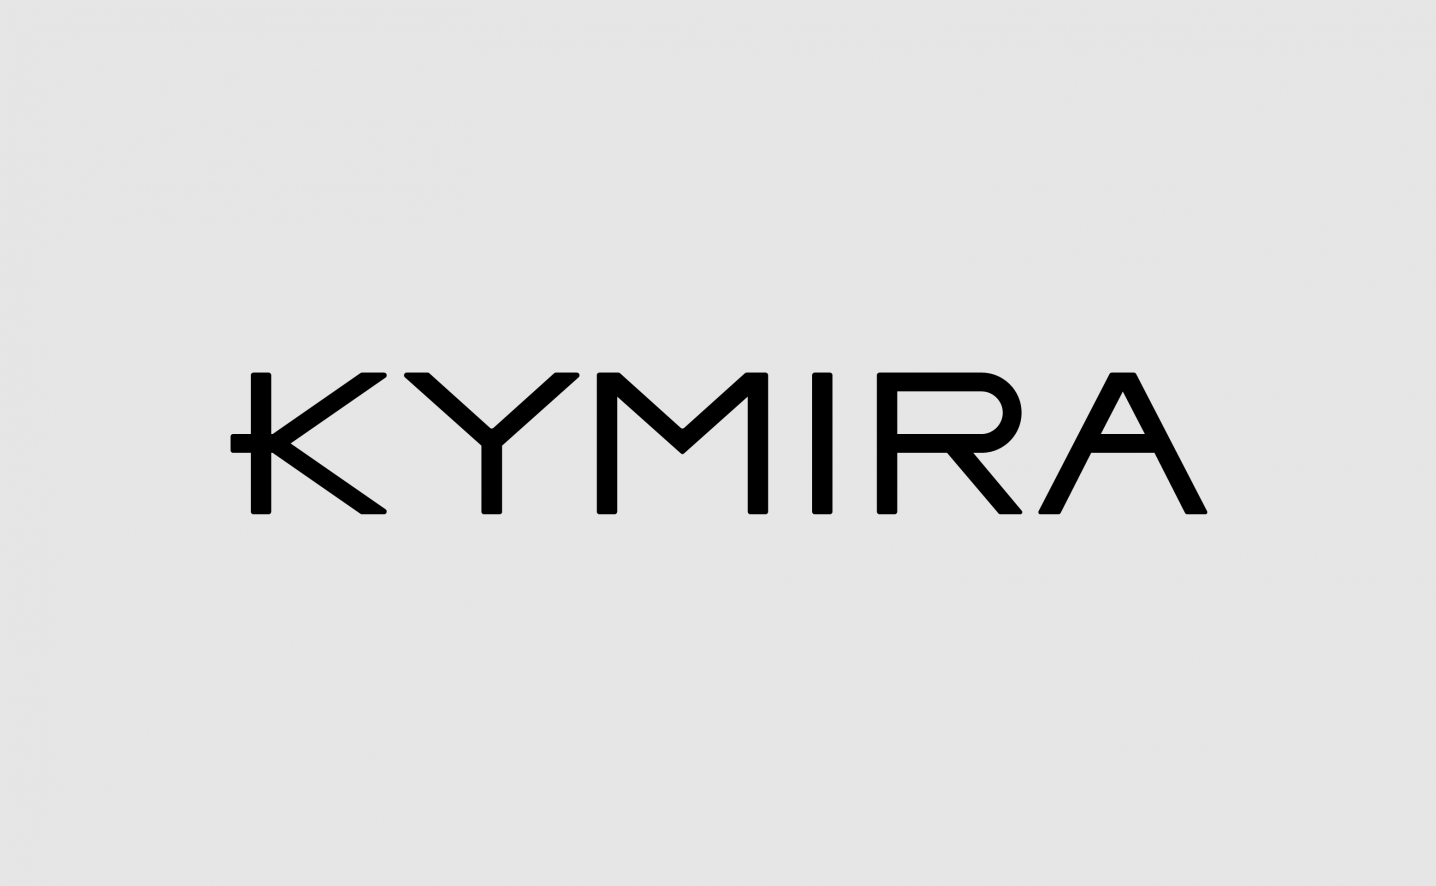 Kymira-logo-design-1